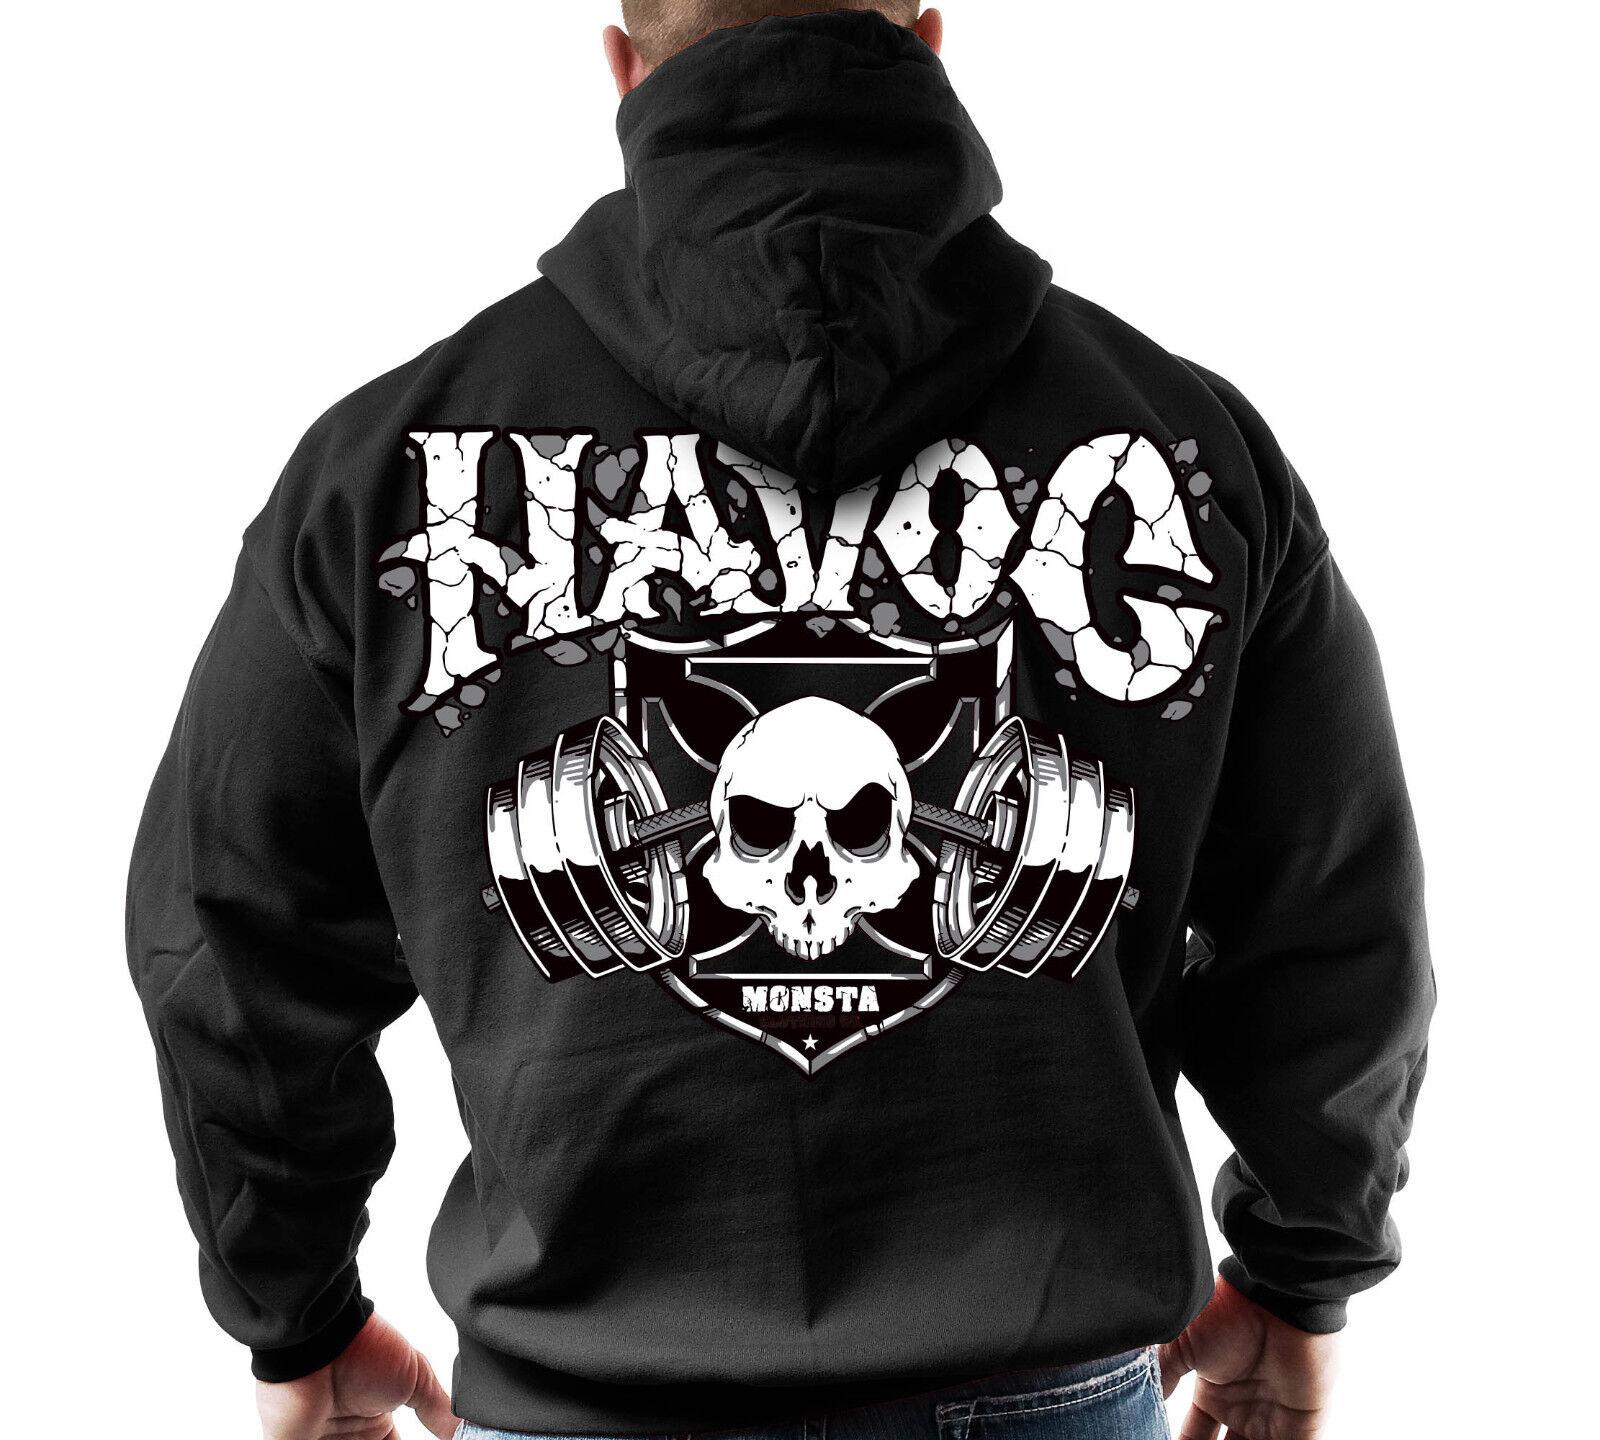 Monsta Clothing Fitness Gym Zipper Hoodie - Havoc